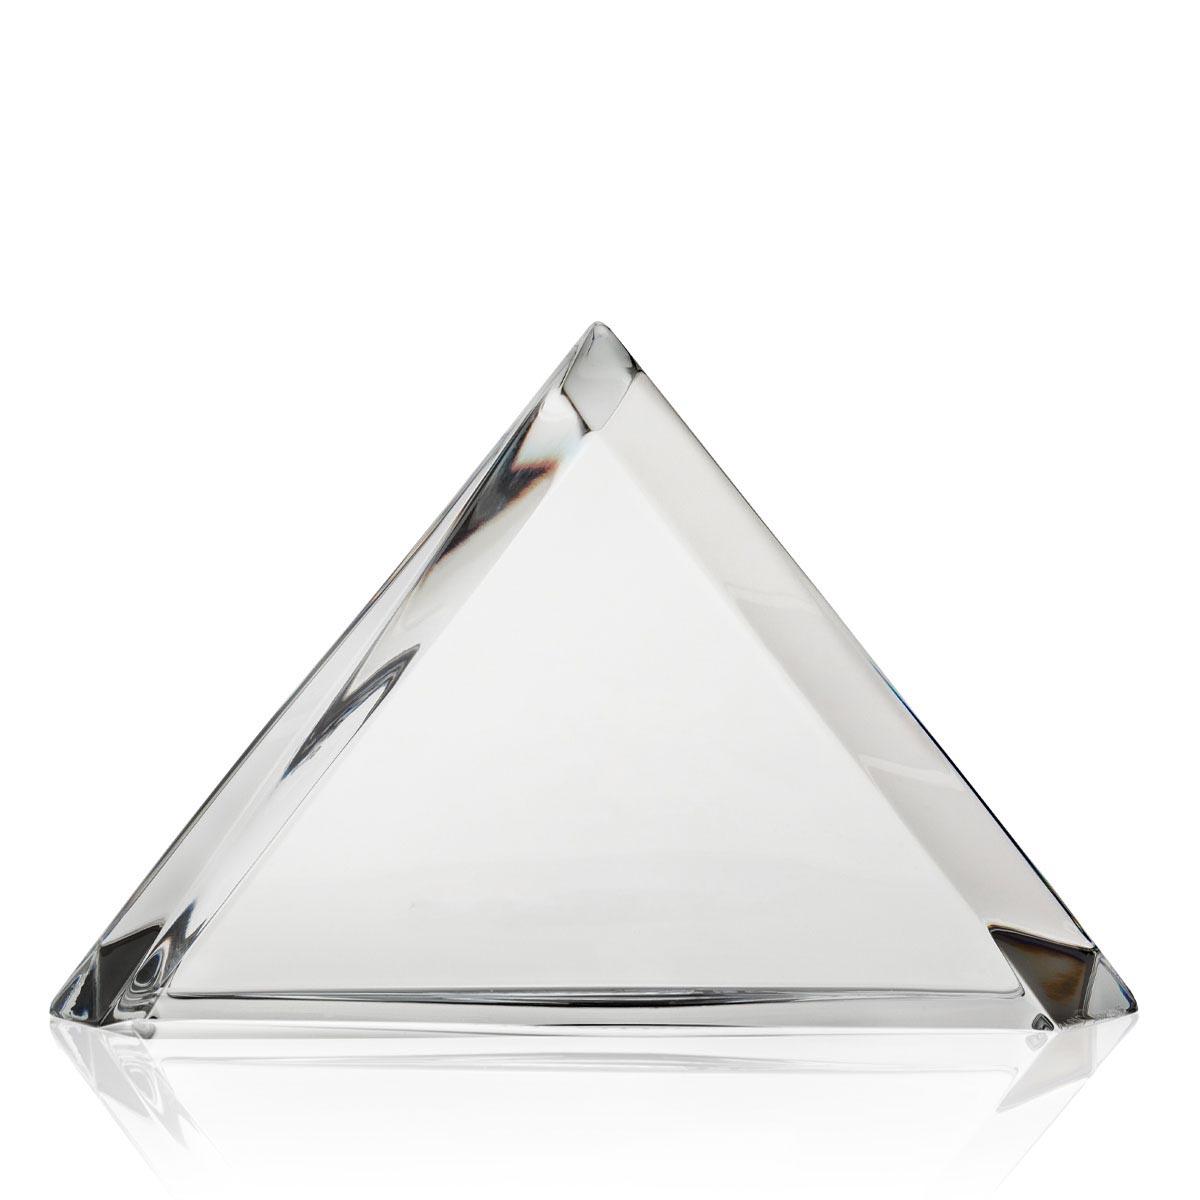 Steuben Desk Accessory, Euclidean Award Large